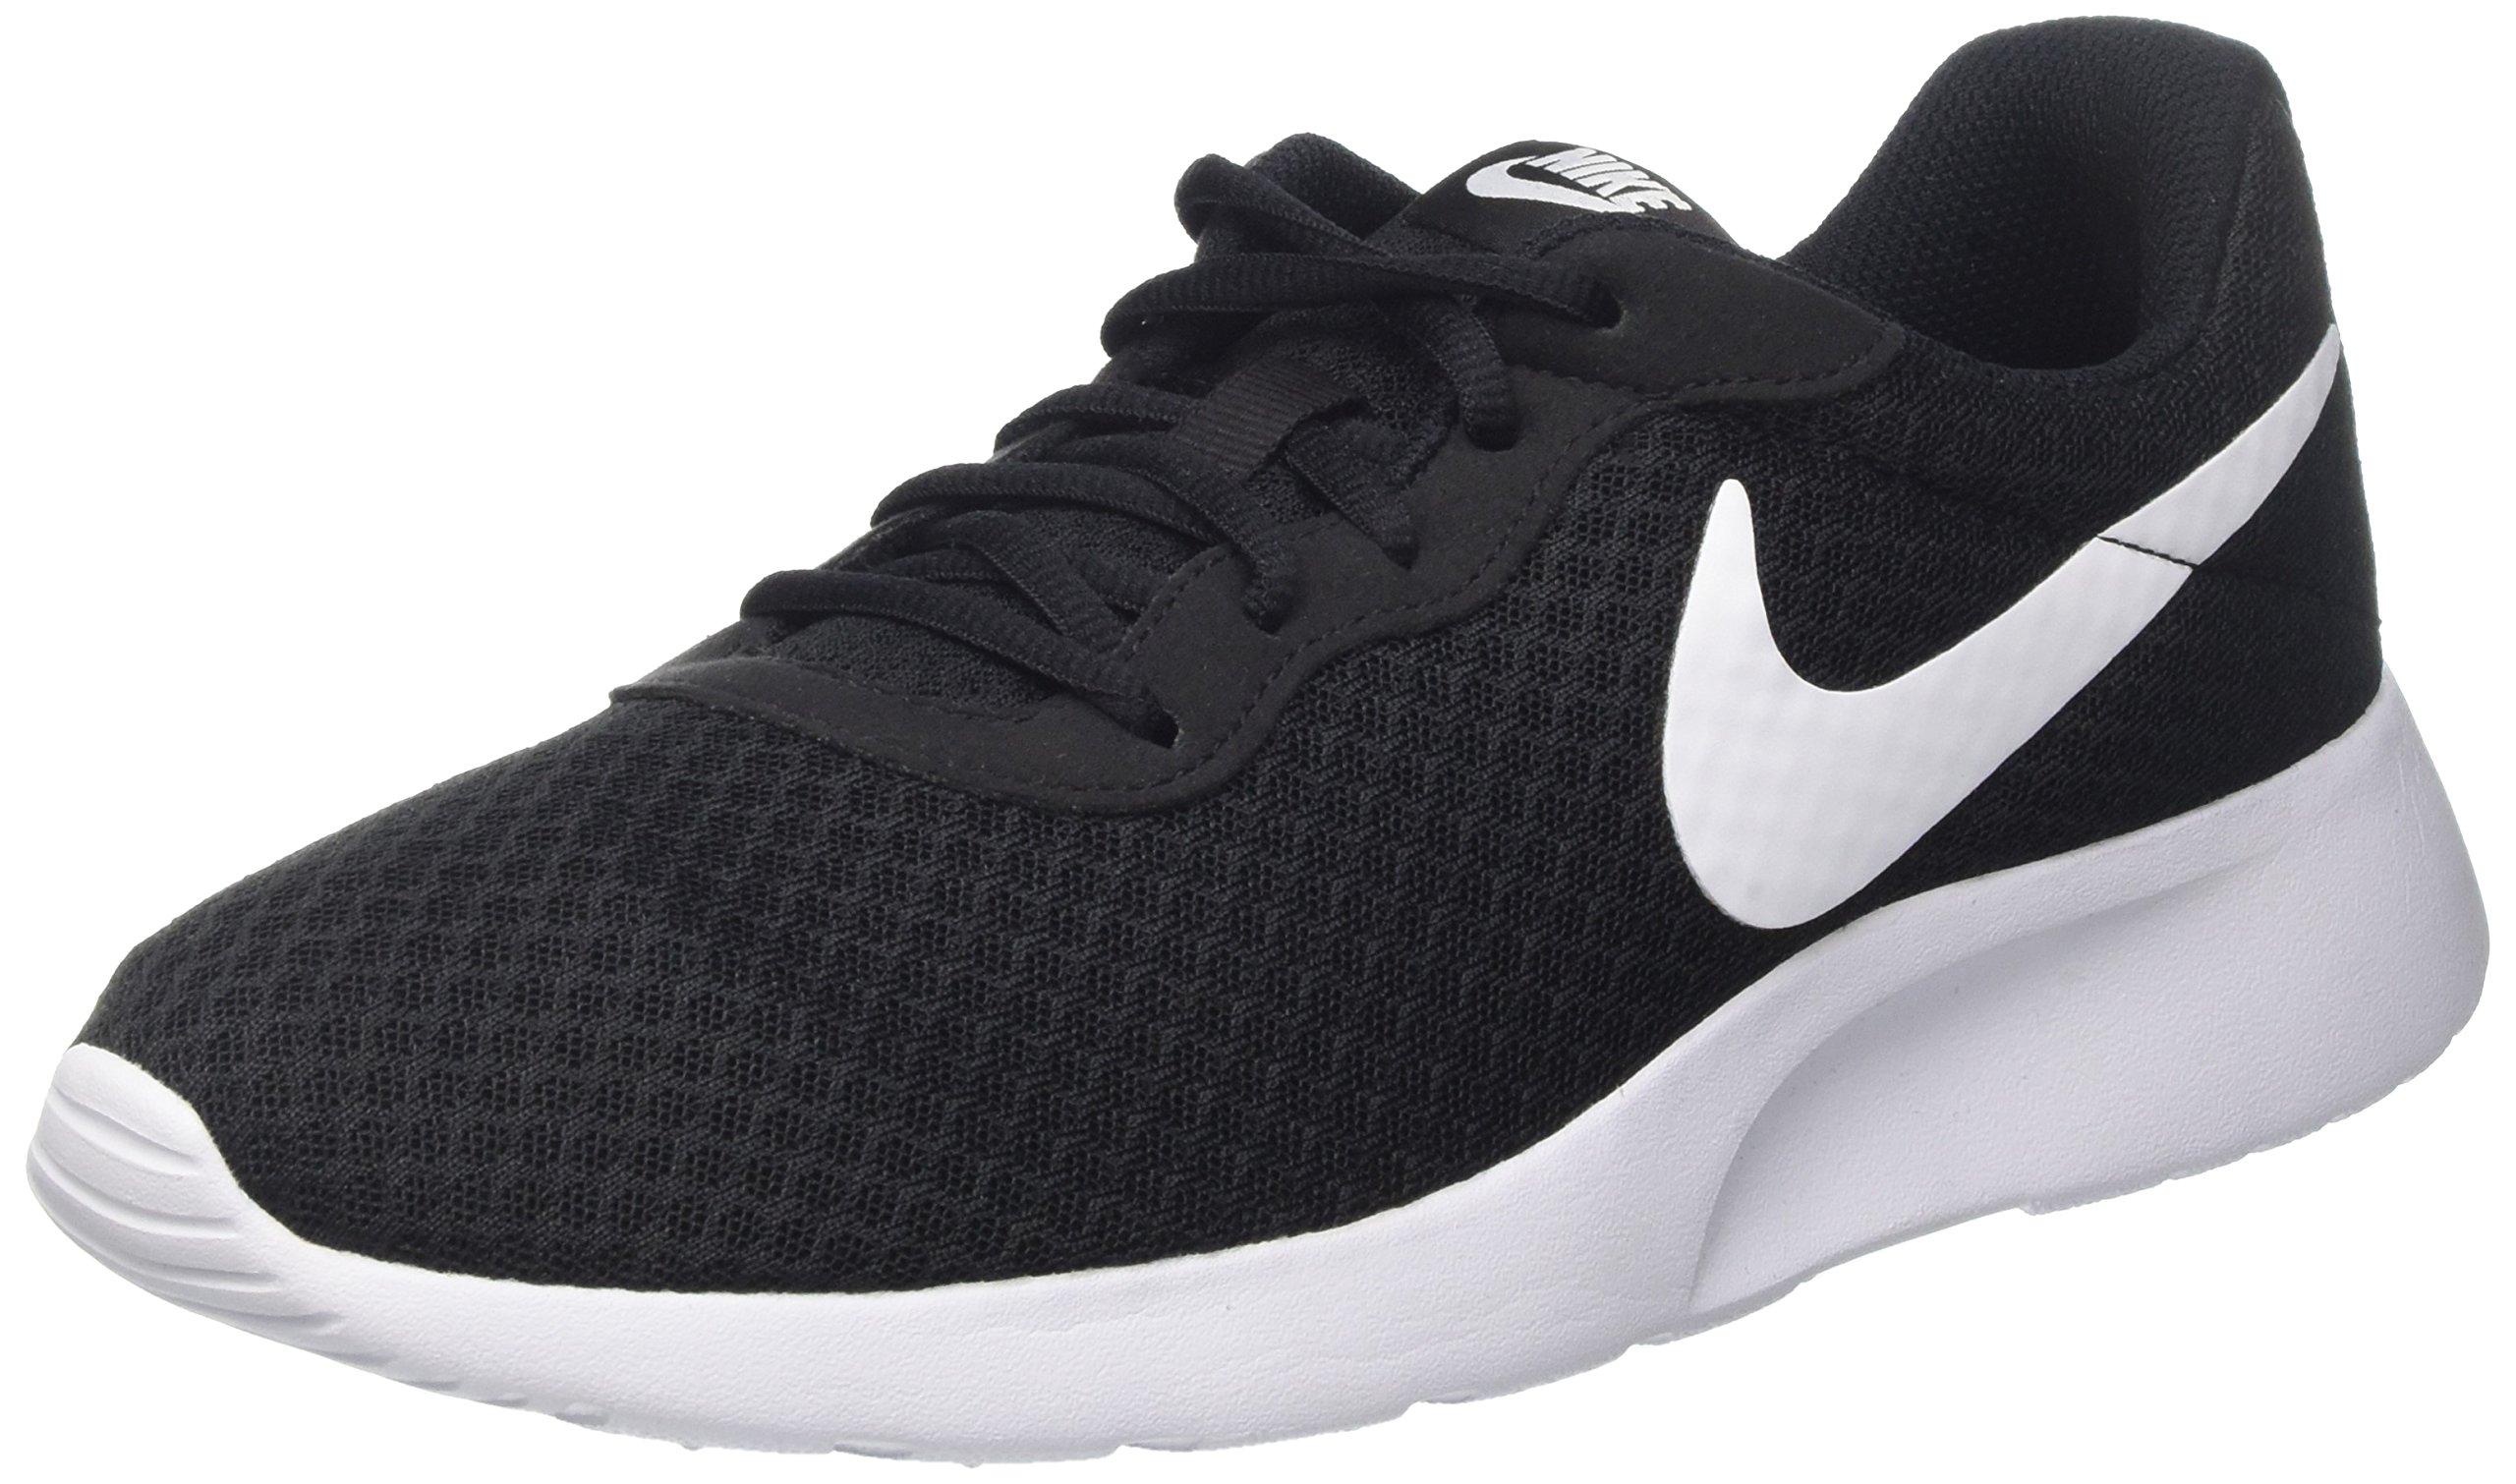 NIKE Womens Tanjun Running Sneaker Black/White (10)